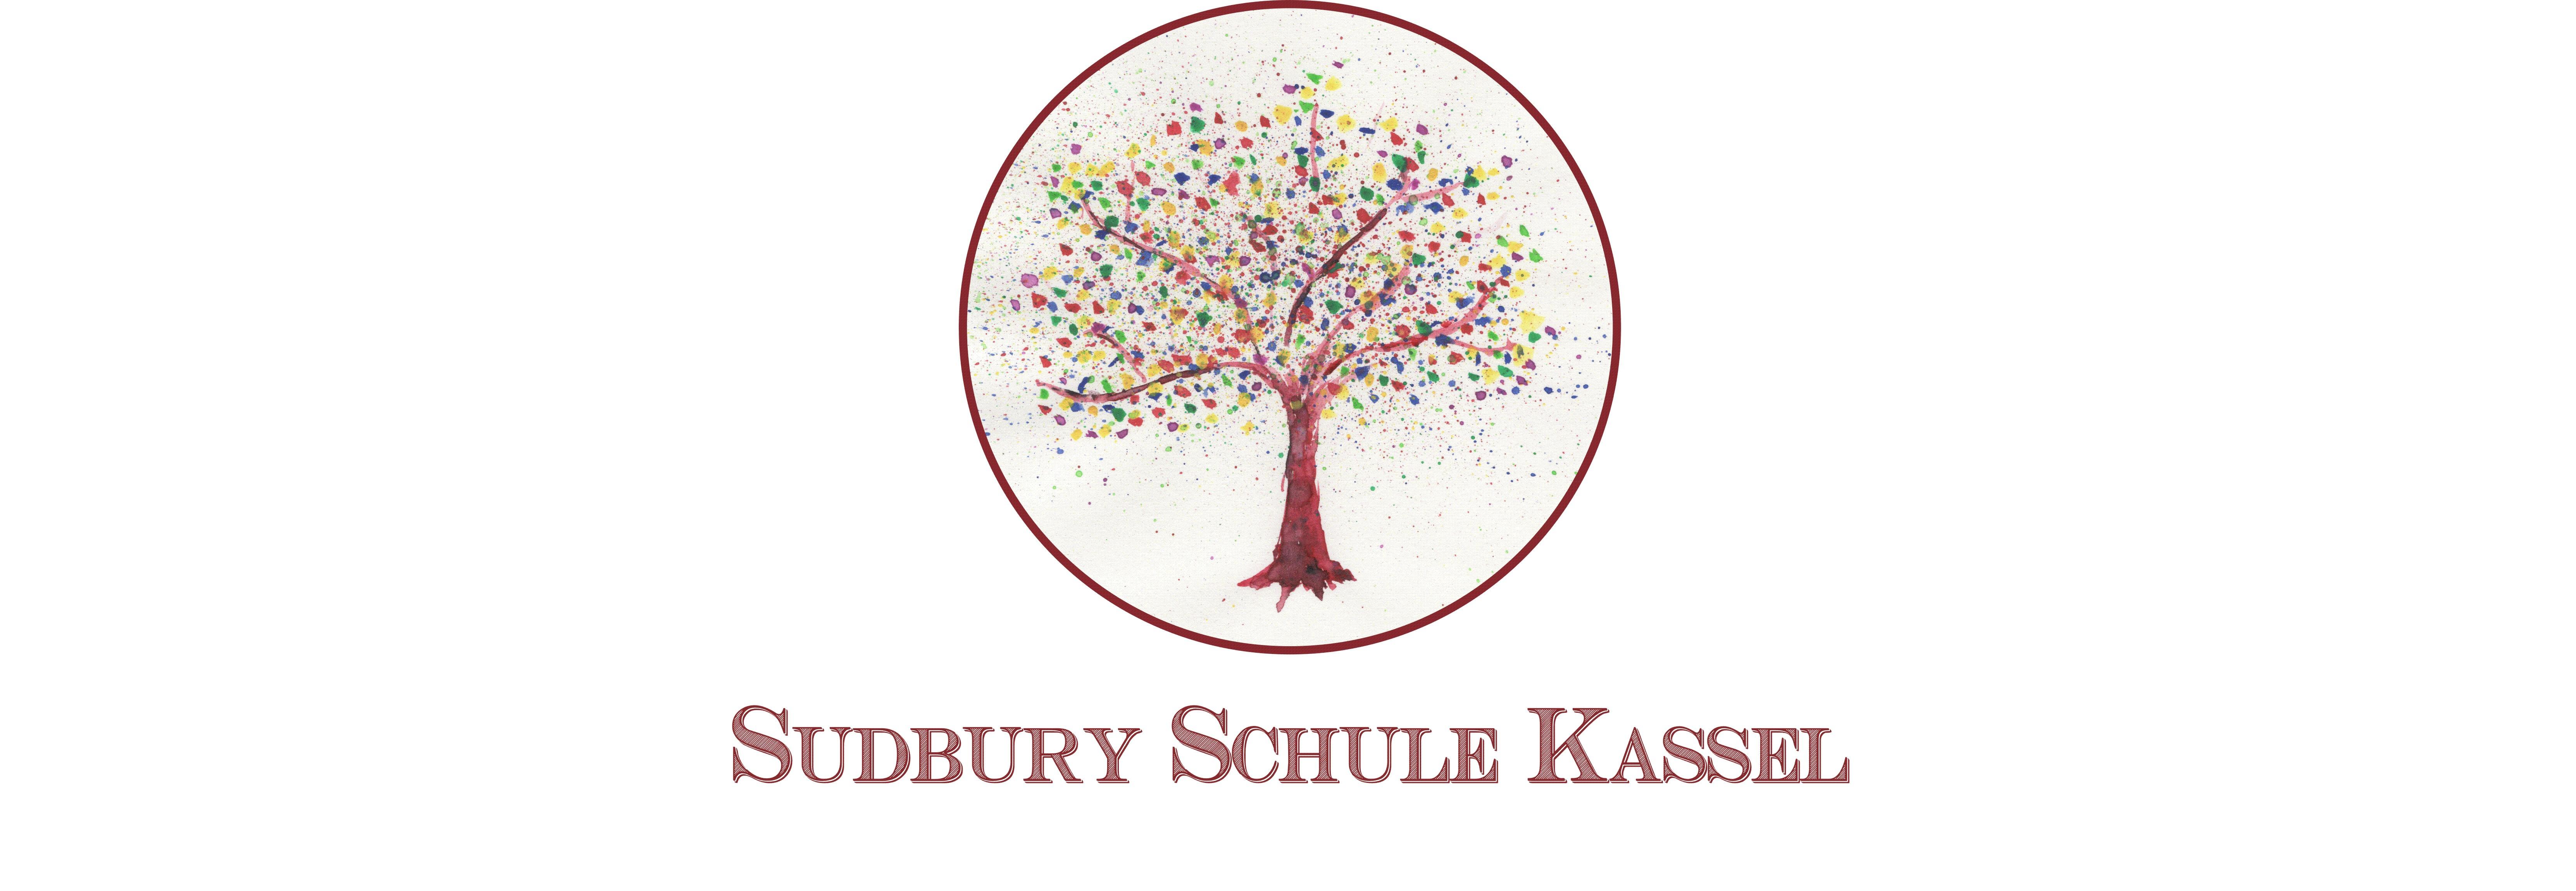 Gründungsinitiative Sudbury Schule Kassel